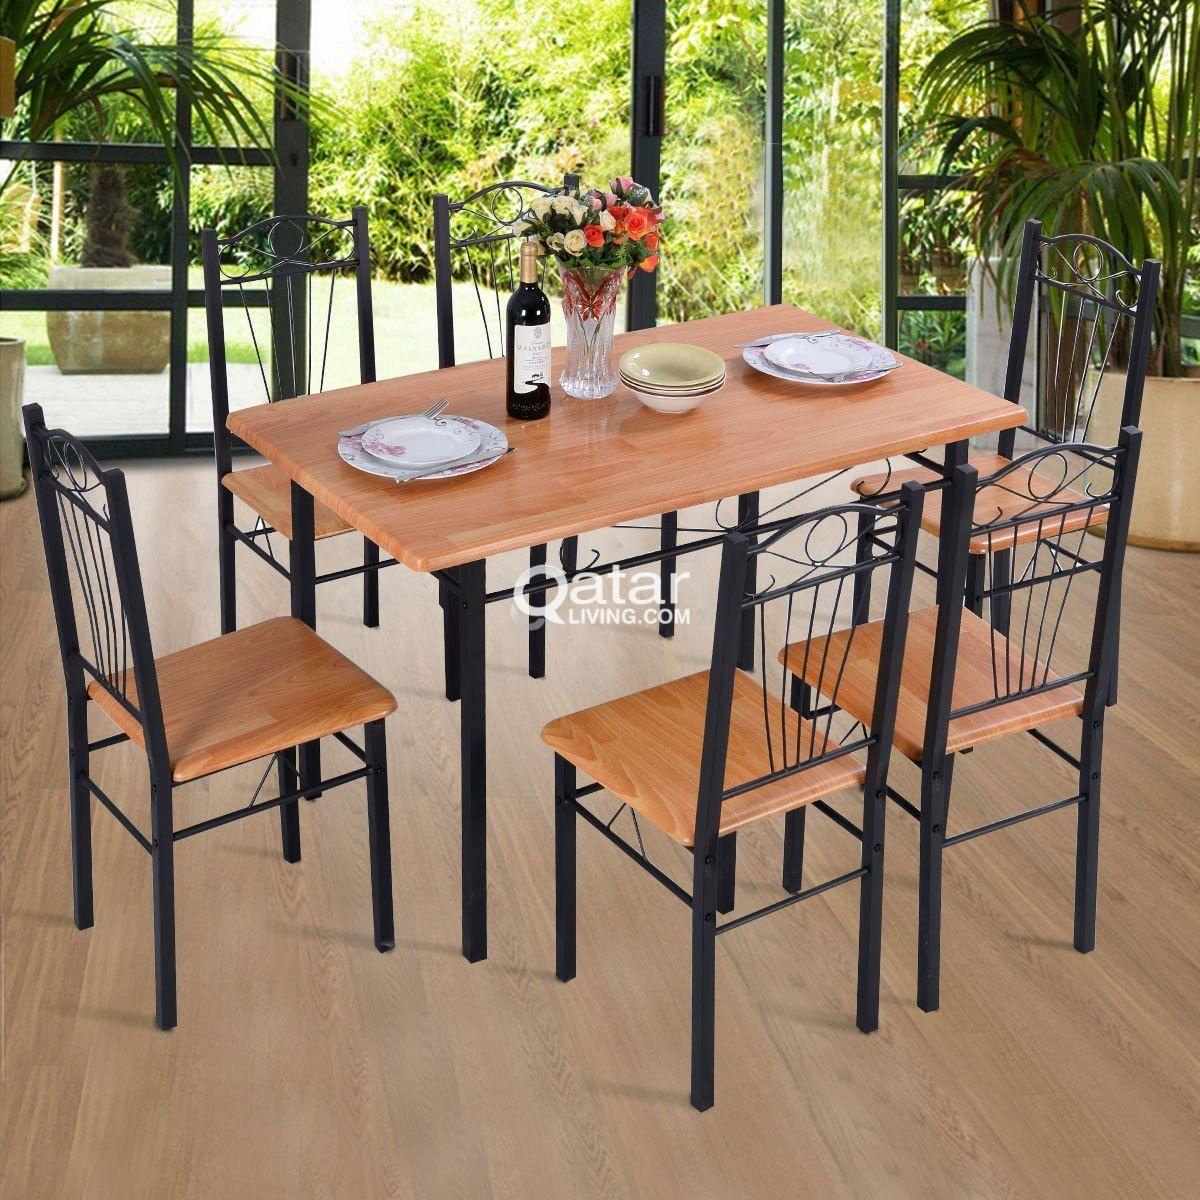 Furniture All New Furniture sale.please call: 70103195